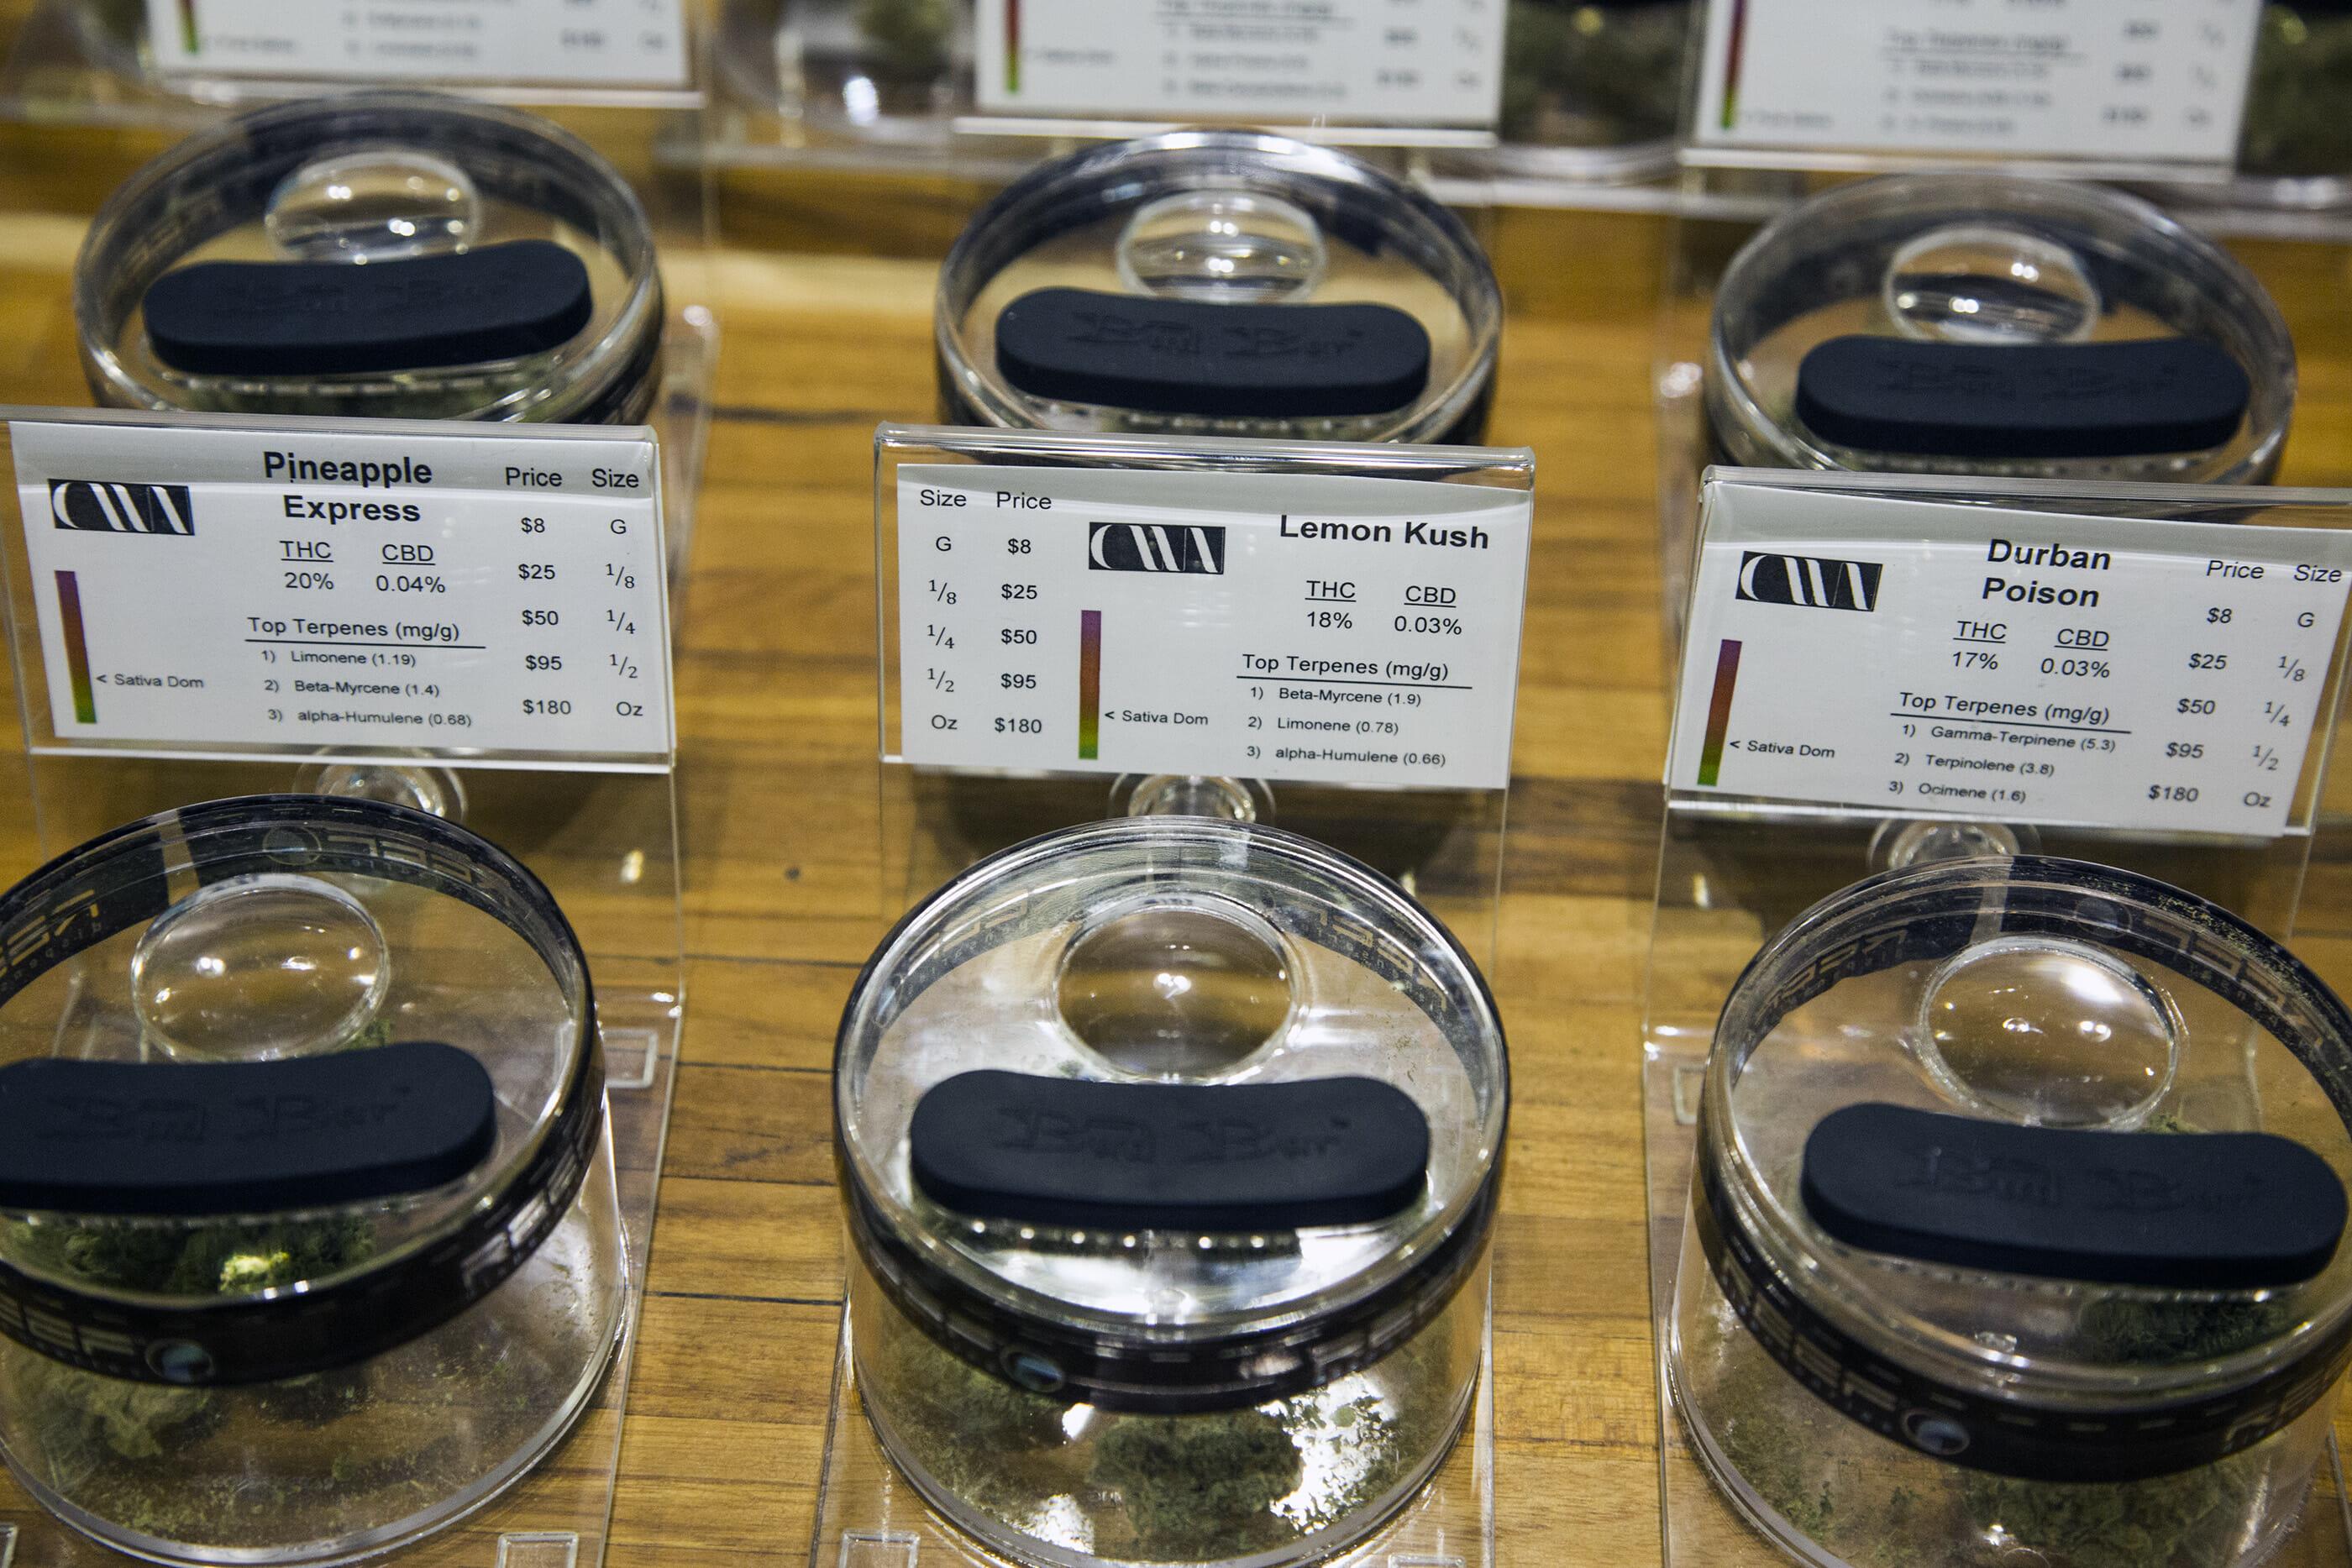 Cannabis strains on display